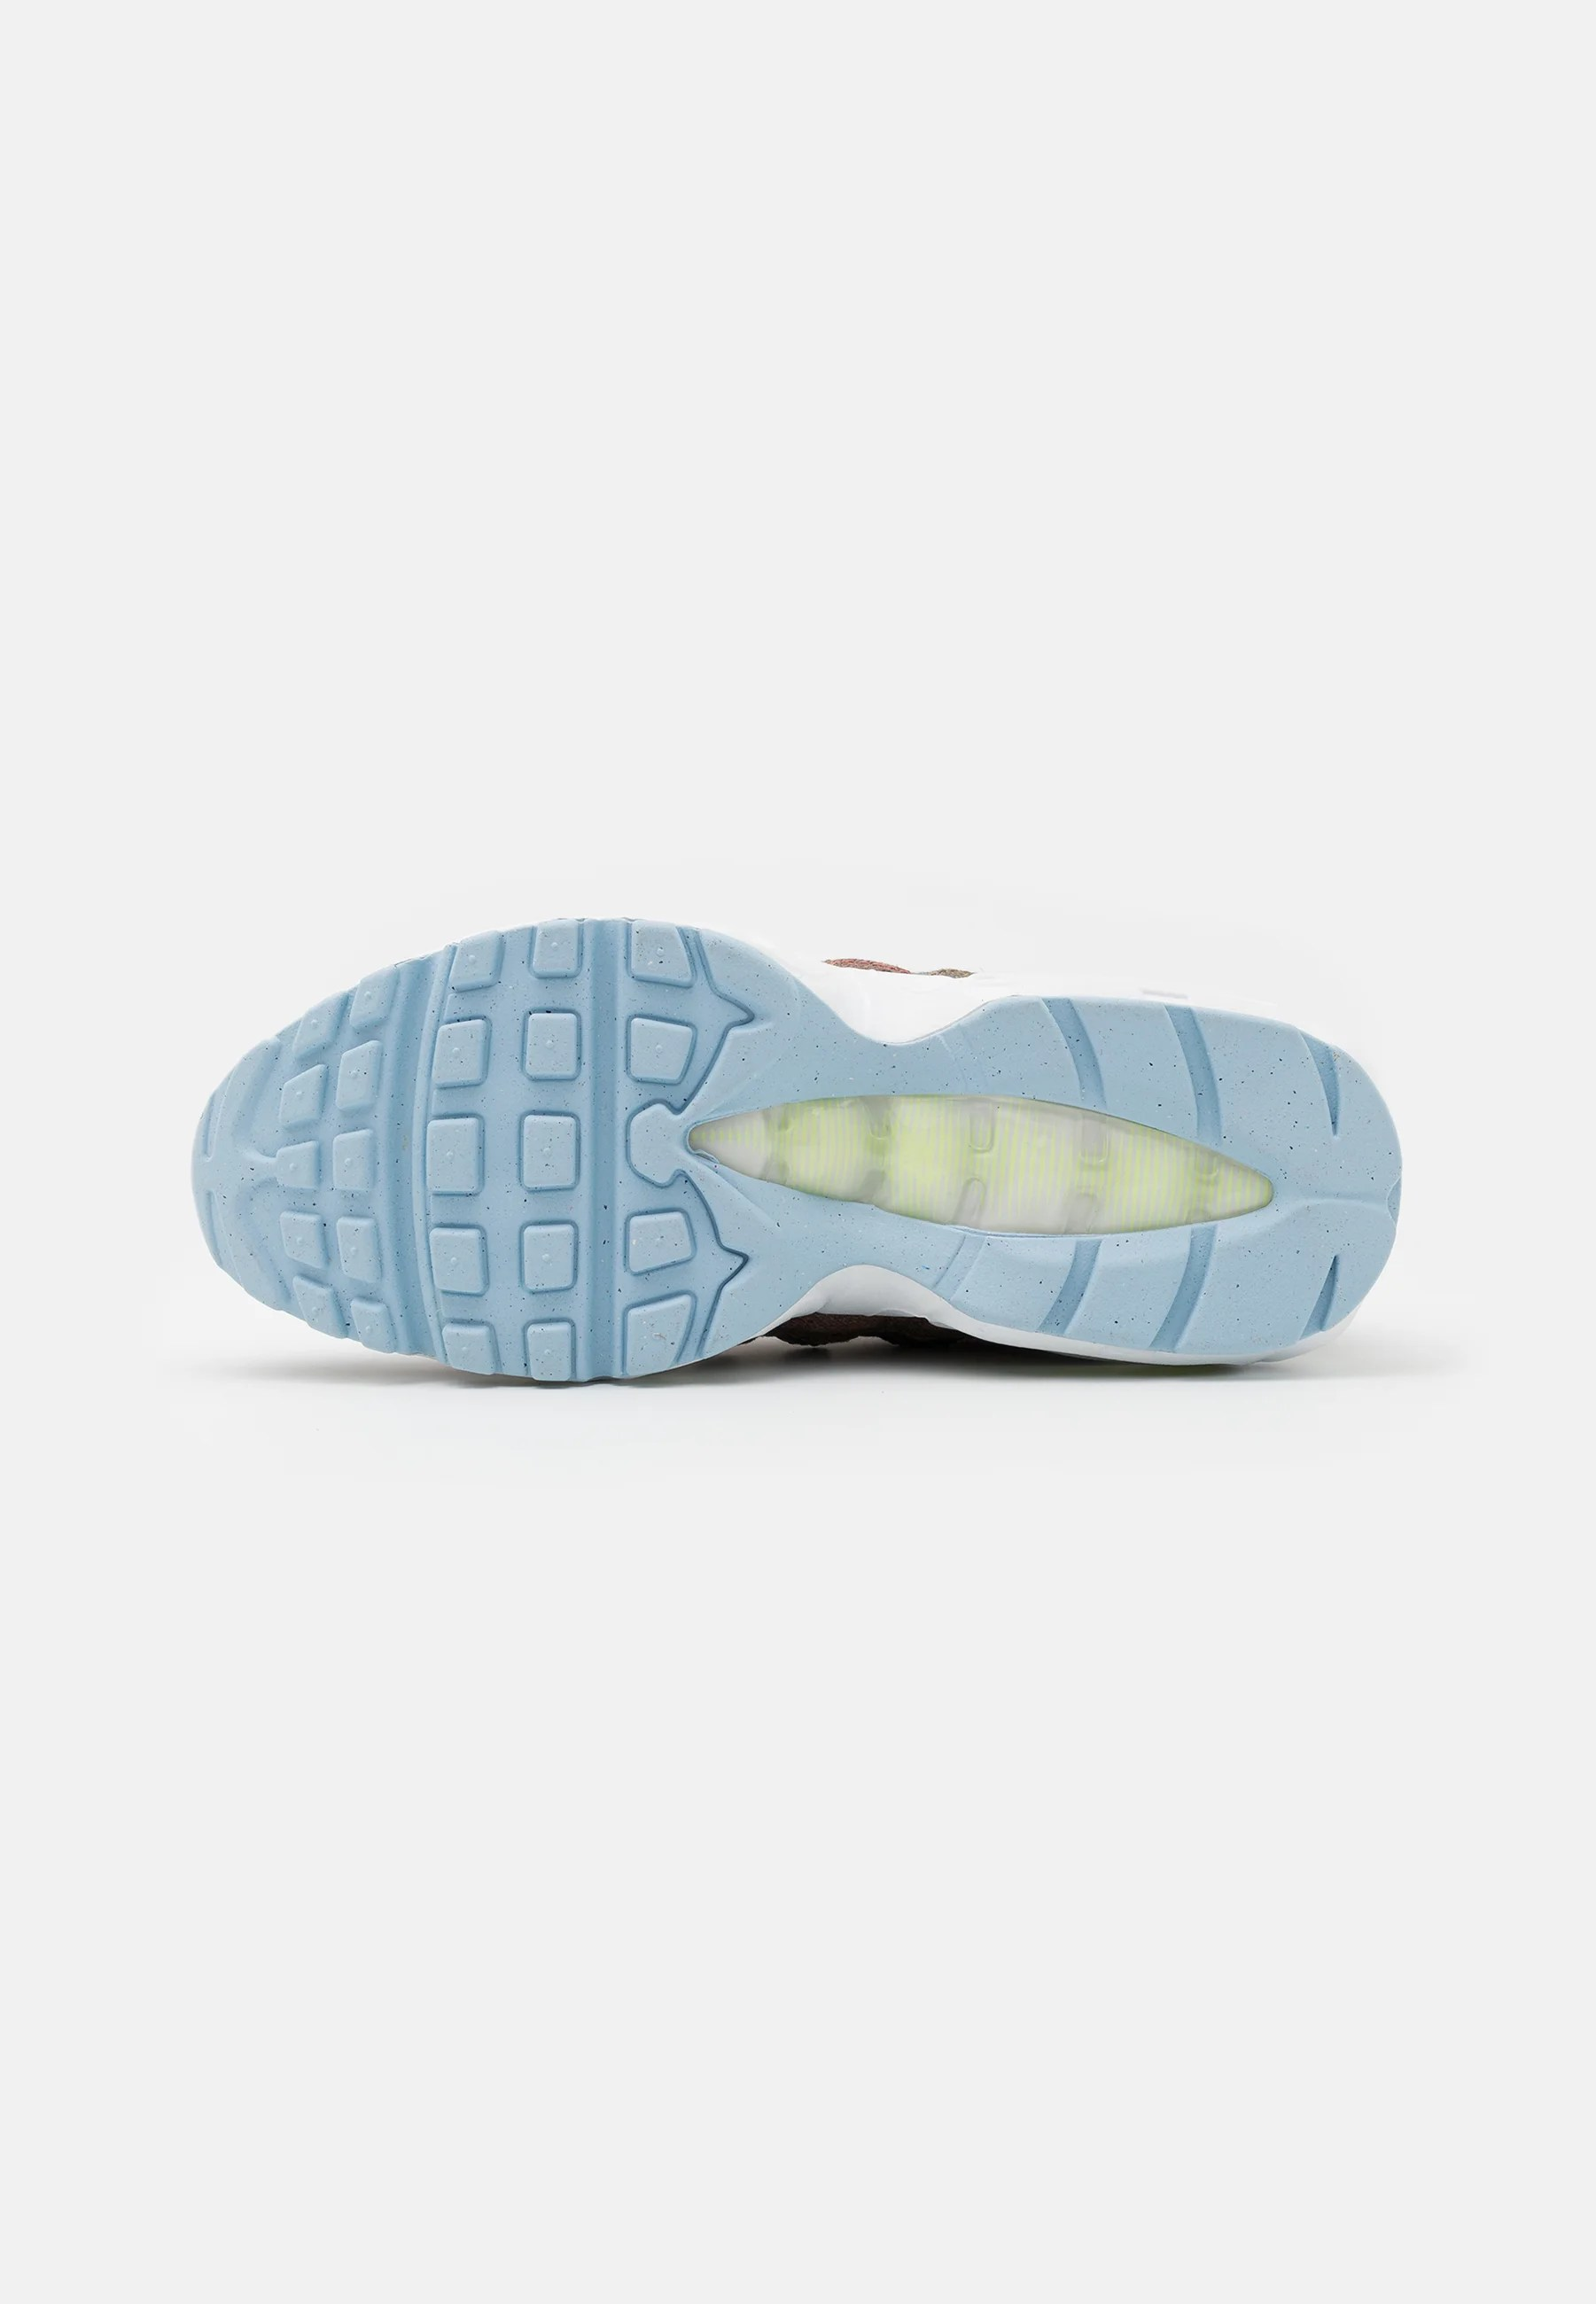 air max 95 nrg unisex sneaker low vast grey white barely volt bright crimson black